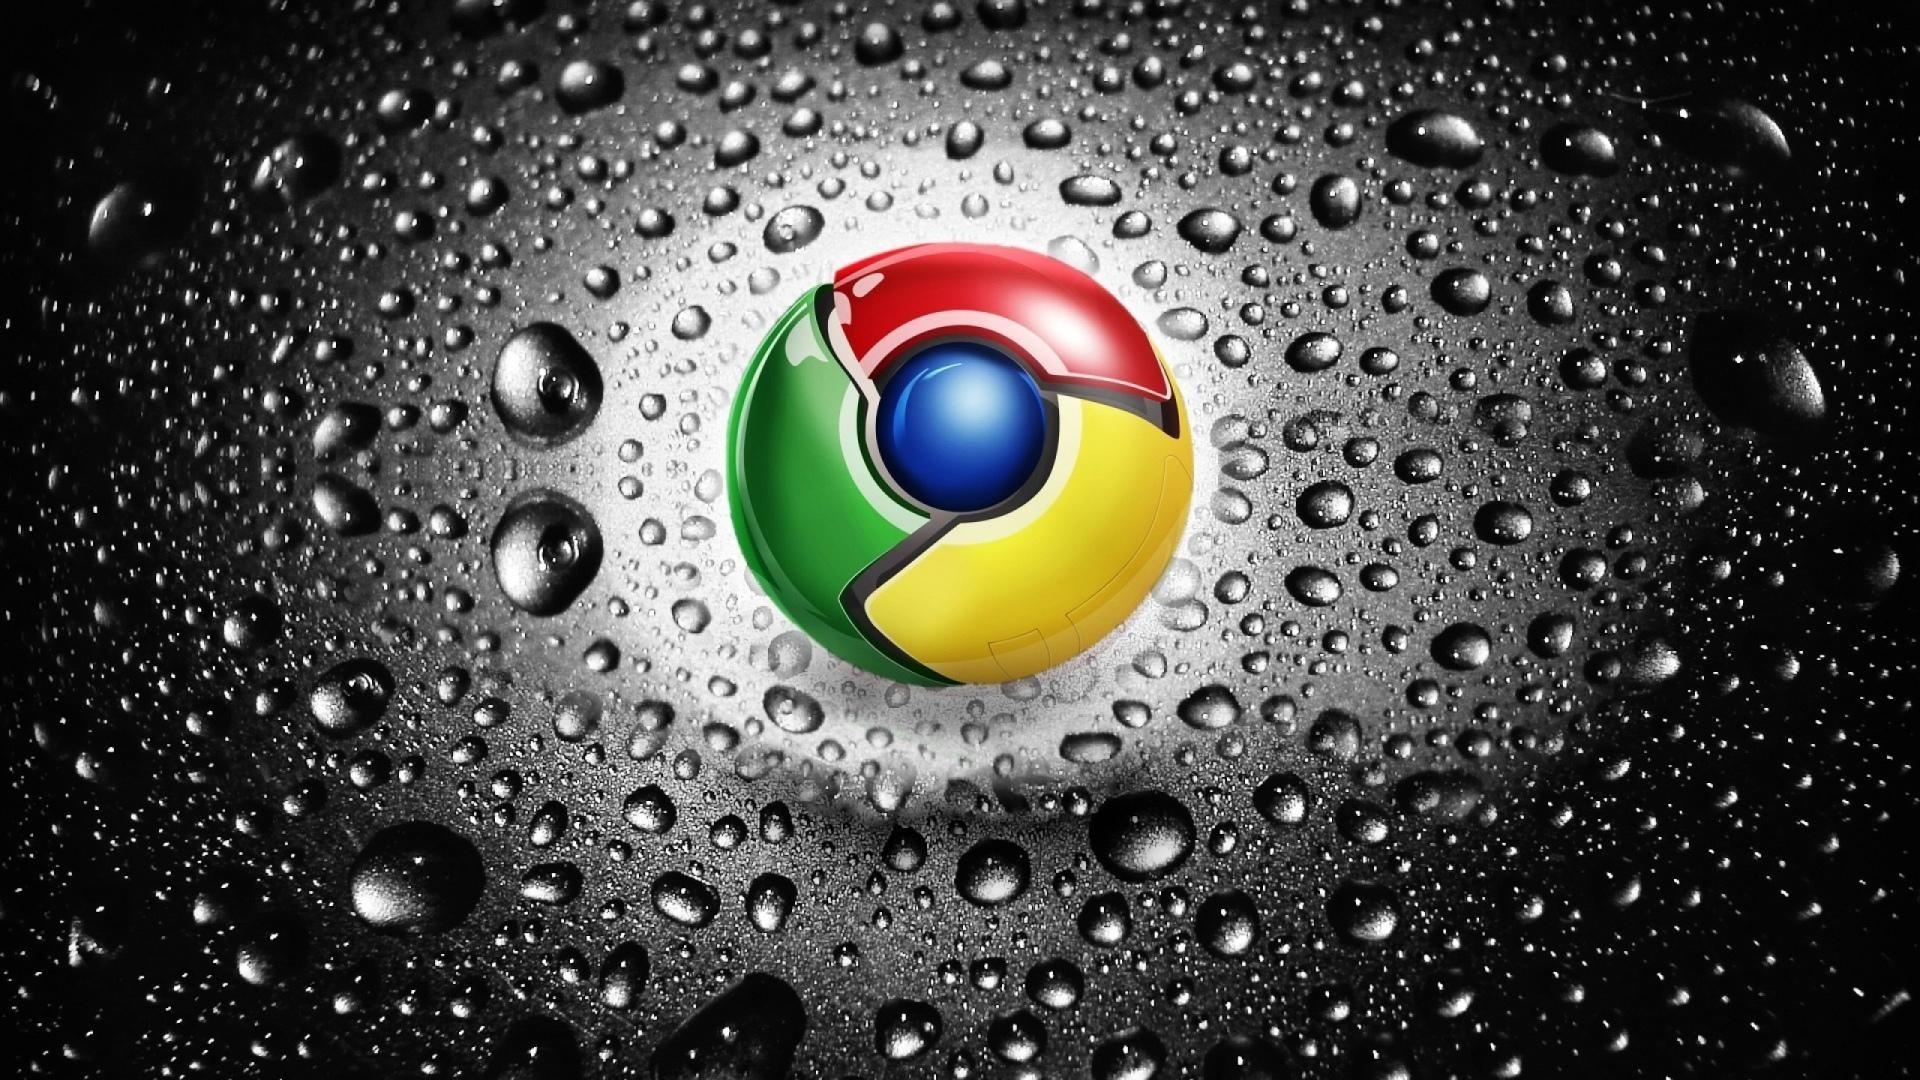 Chrome Wallpaper Picture hd